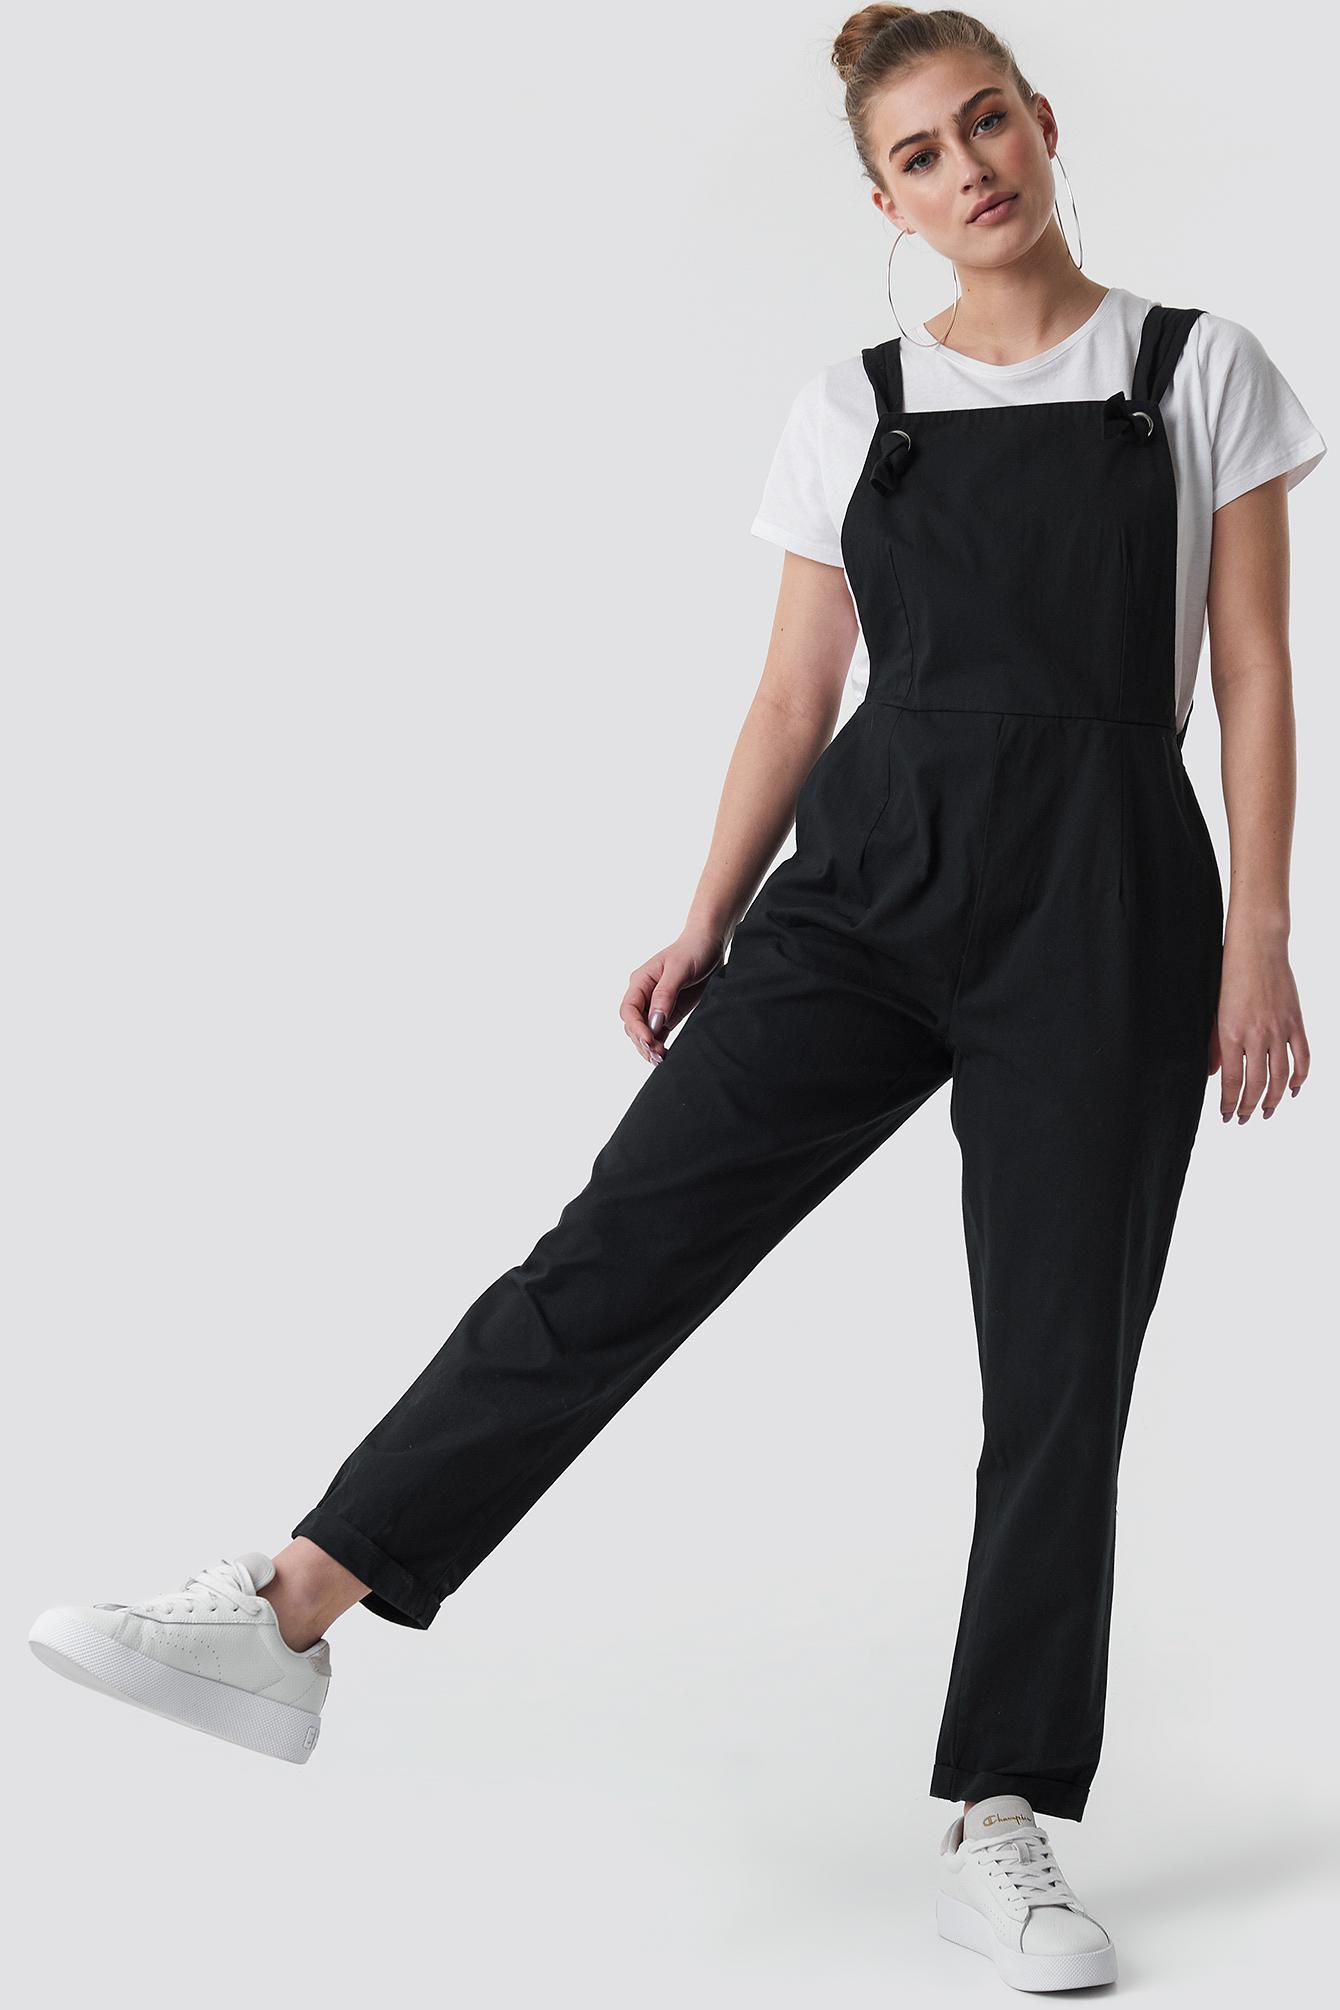 Tie Strap Overall NA-KD.COM